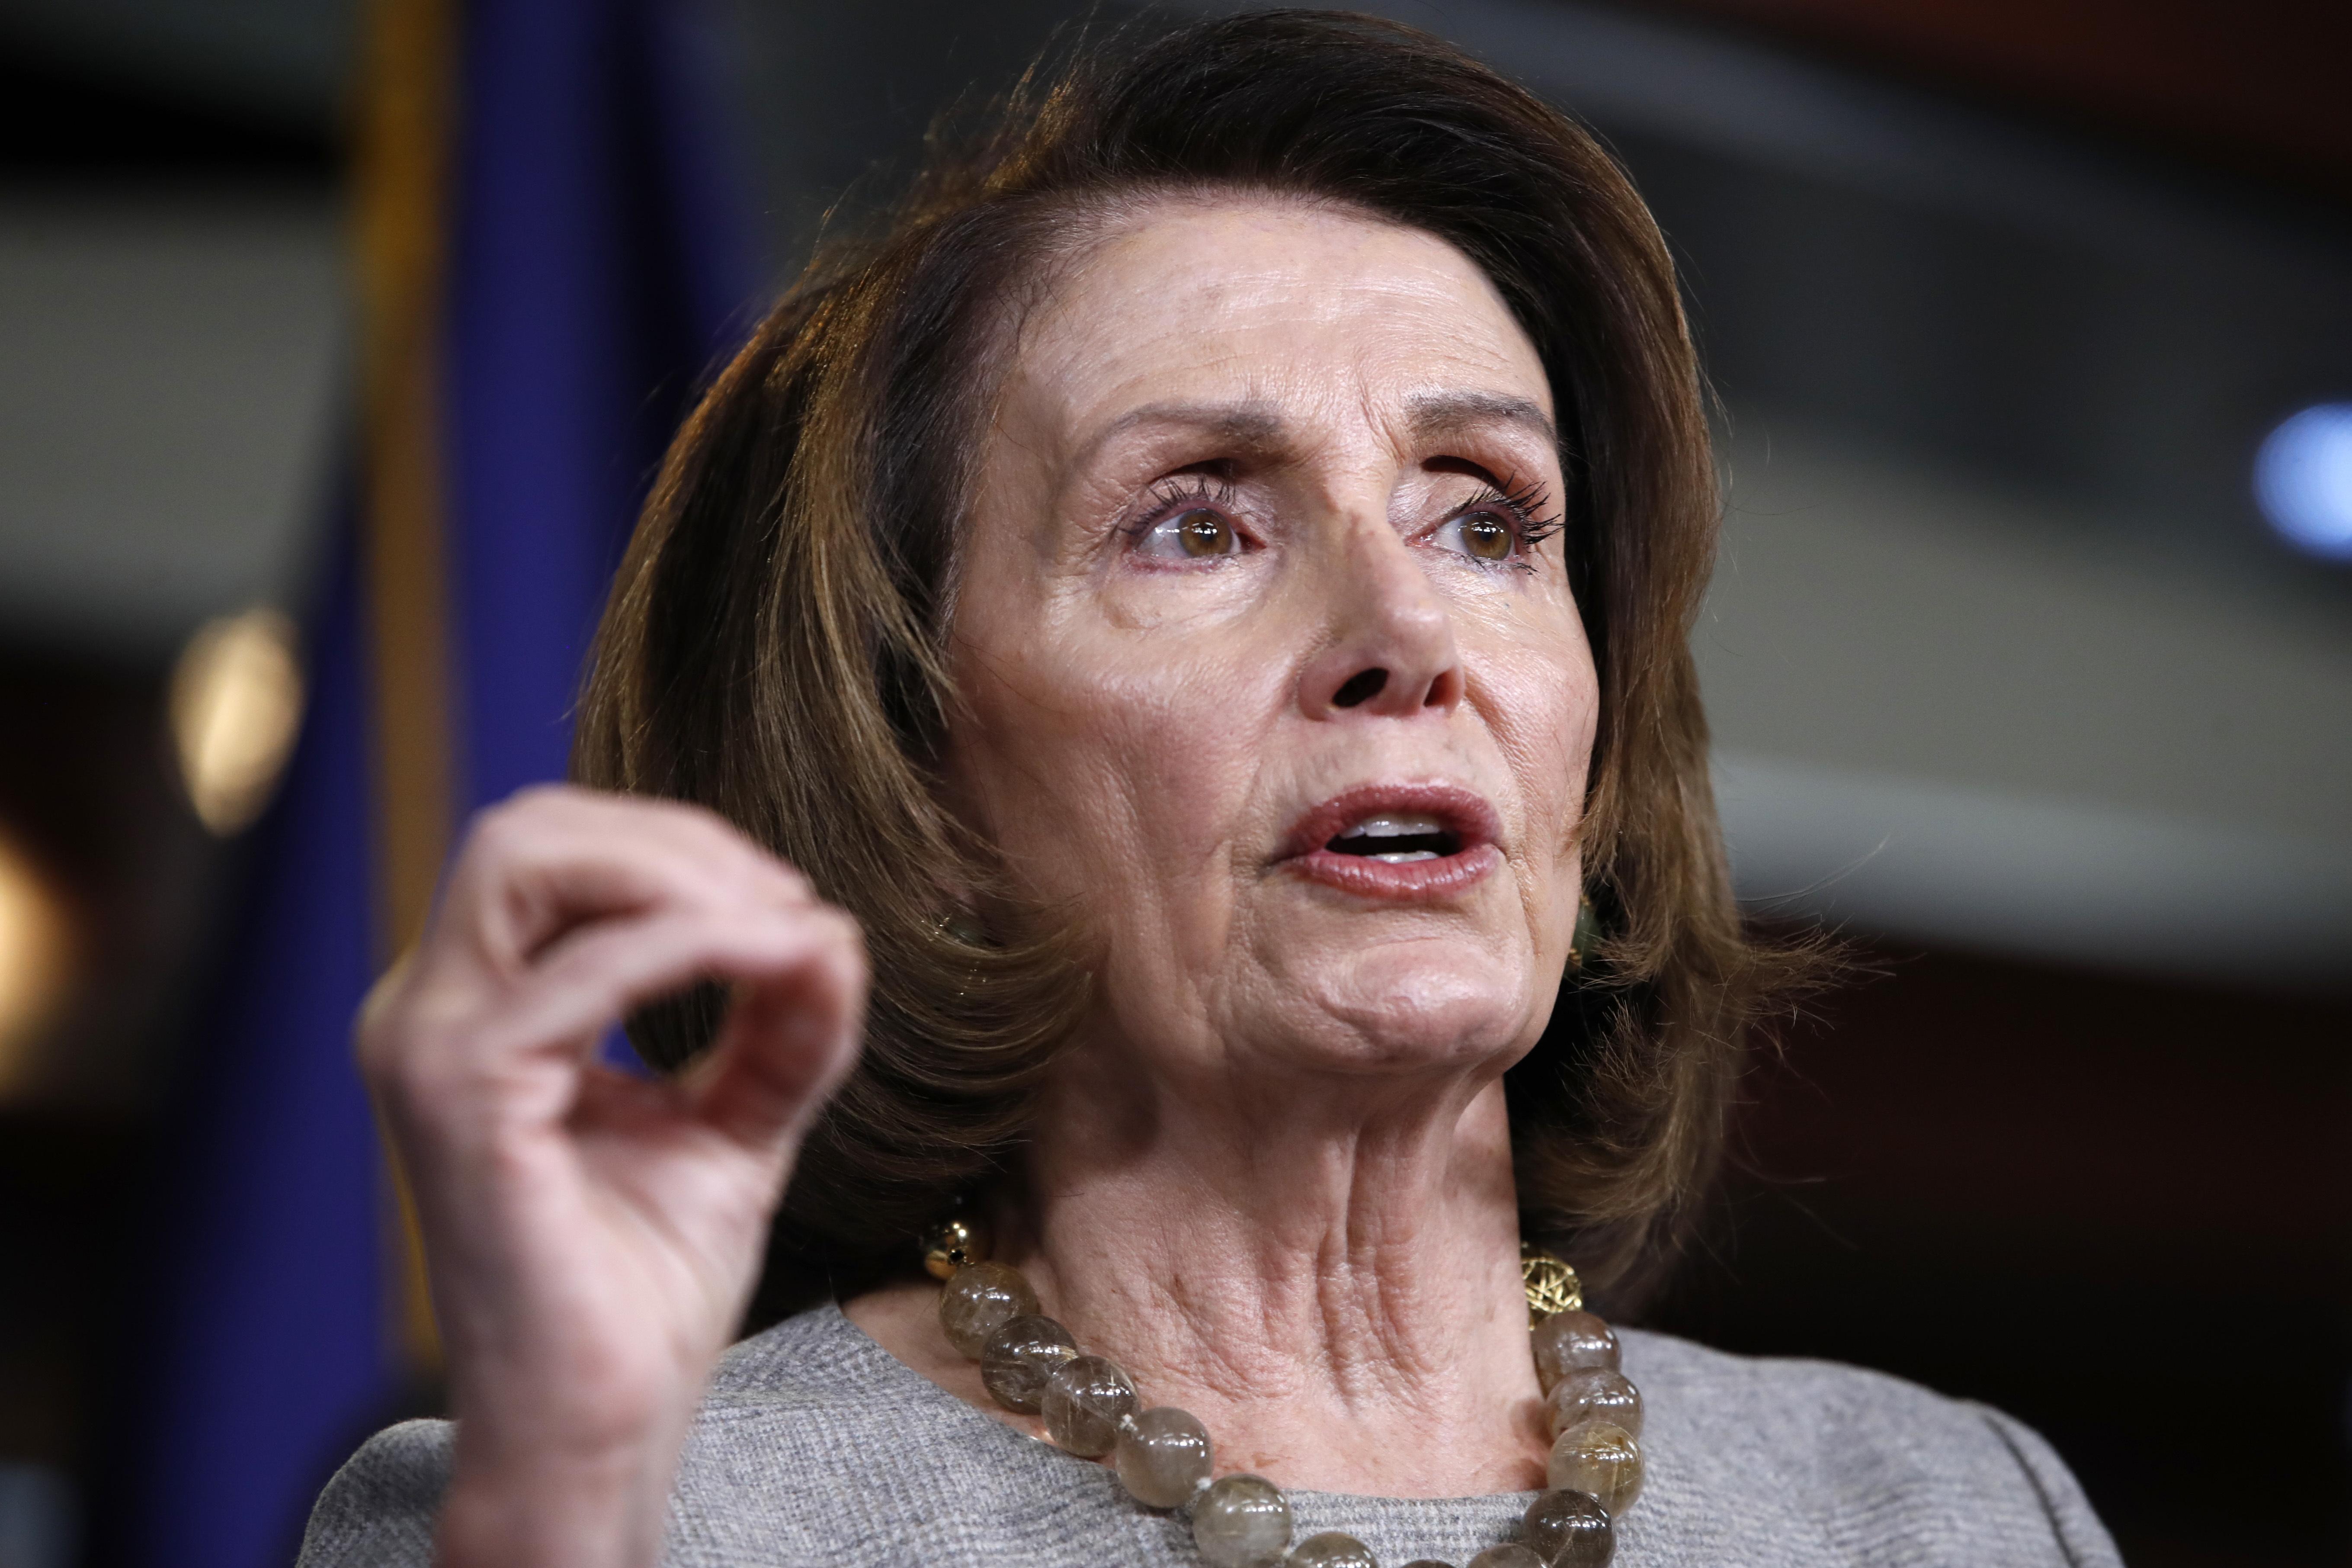 Nancy Pelosi raised nearly $50 million for Democrats in 2017